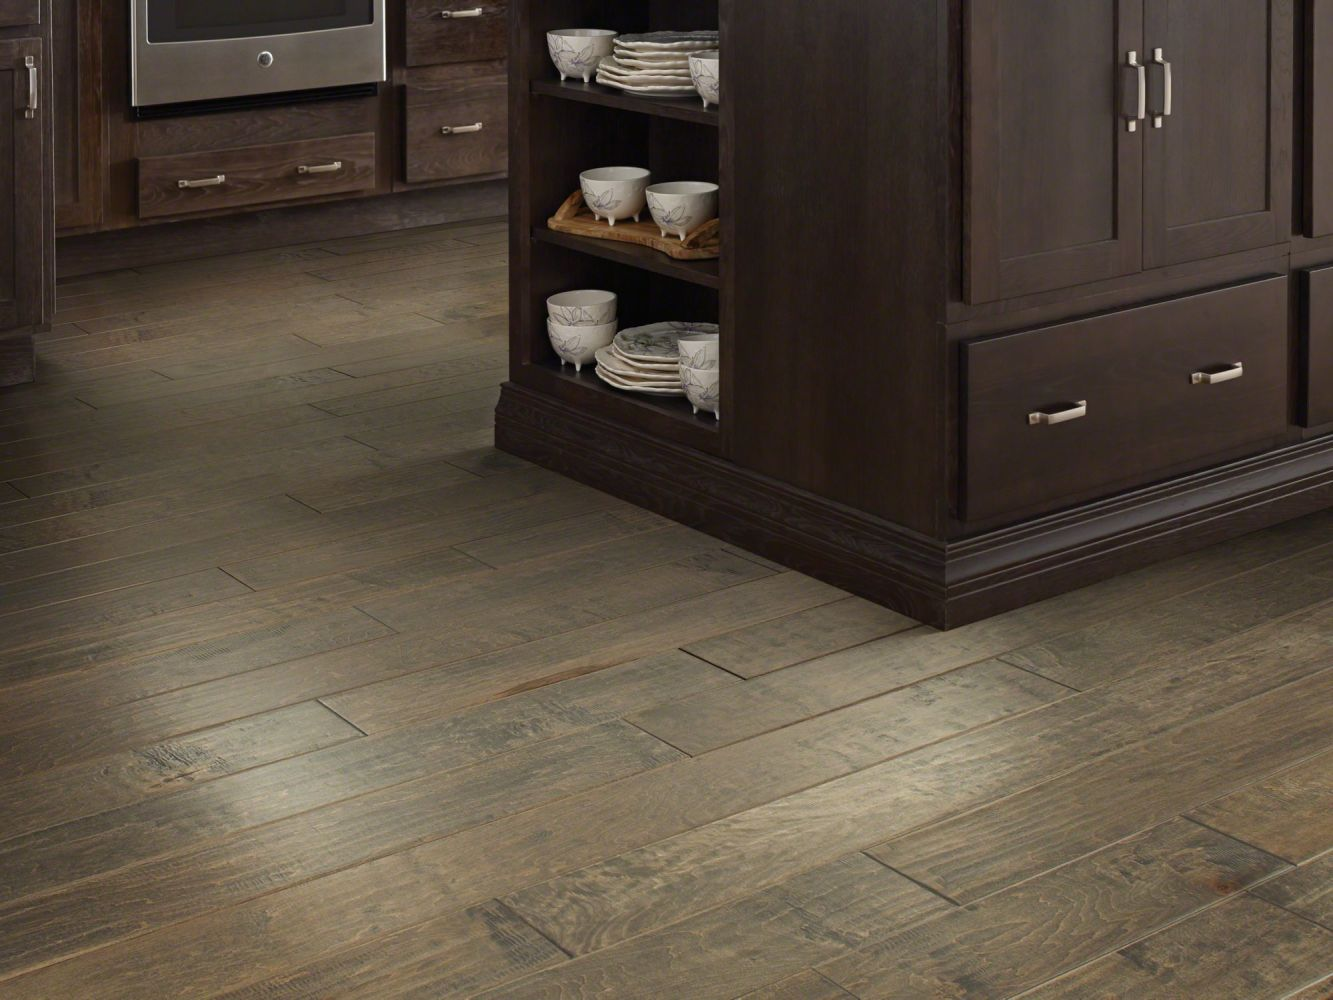 Shaw Floors Home Fn Gold Hardwood Mackenzie Maple 2 -5″ Timberwolf 05002_HW604